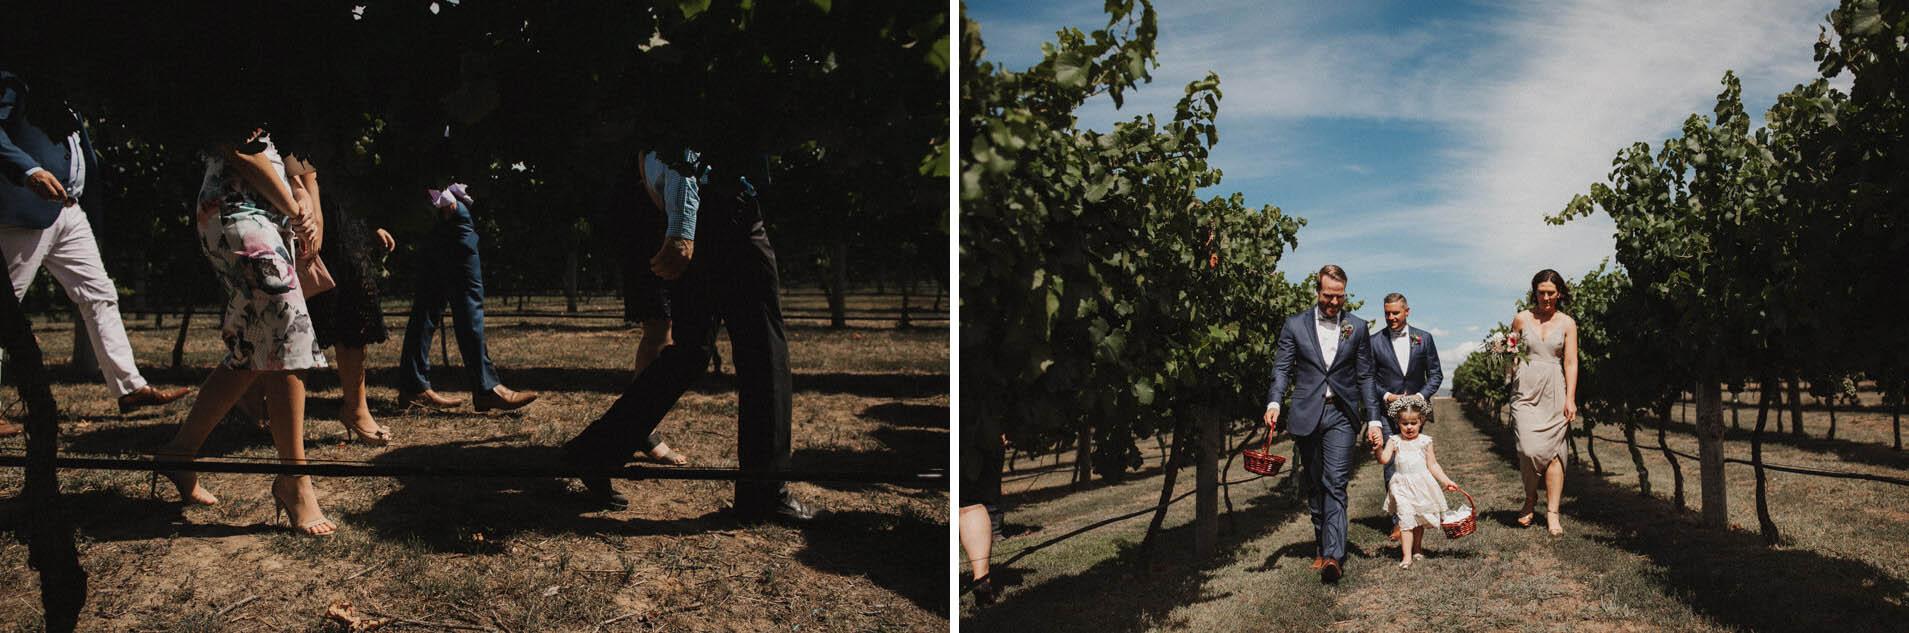 suger-pine-walk-wedding (Corinna & Dylan)_116(1295)2.jpg